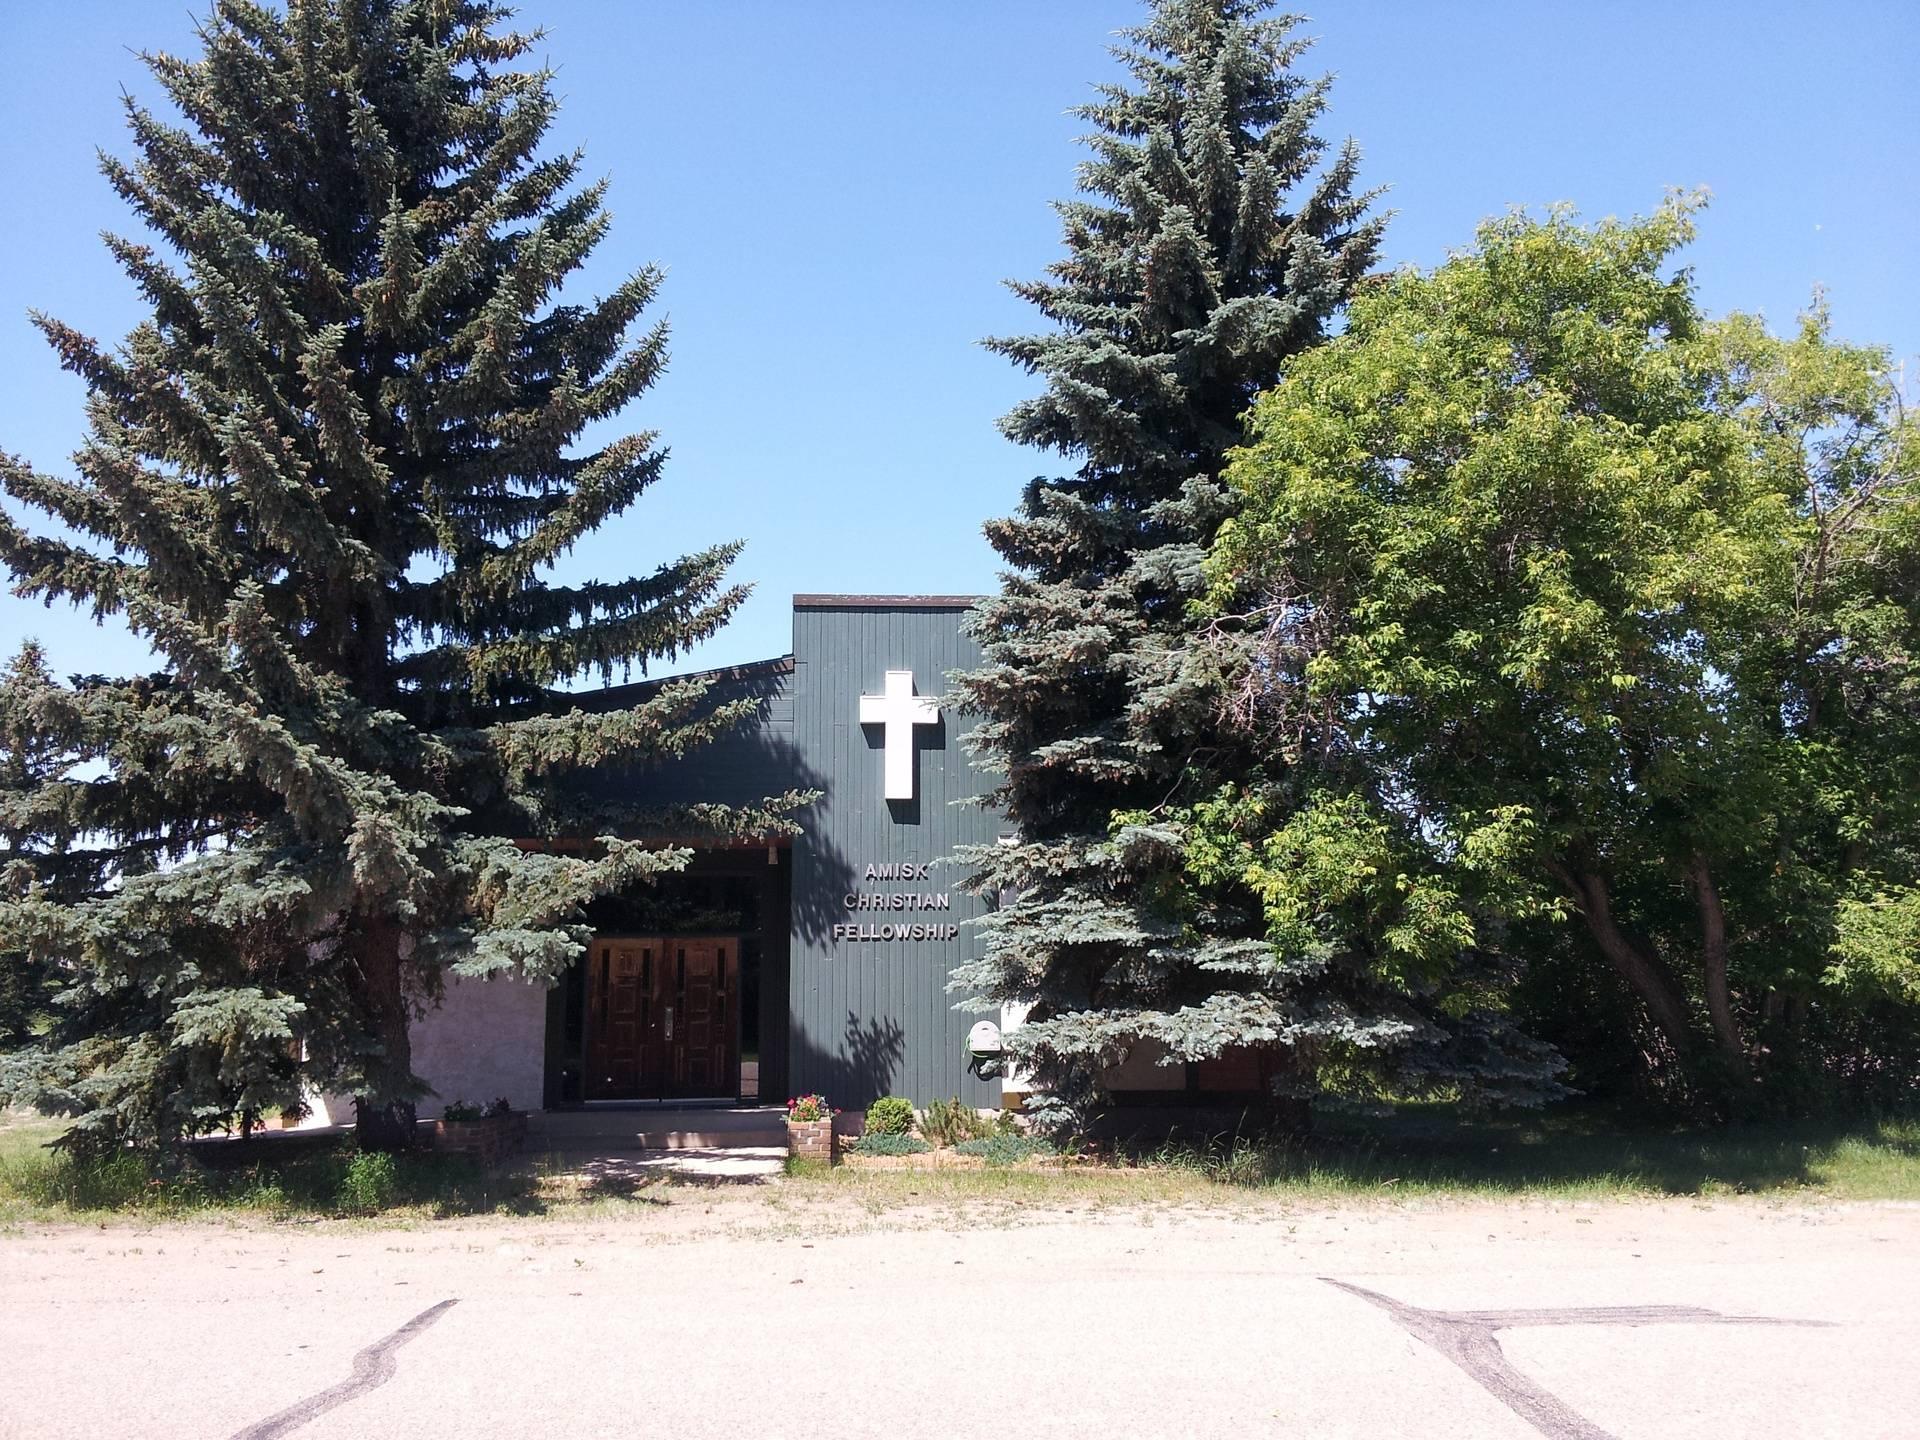 Amisk Christian Fellowship, Po box 107, 4832 50th St, Amisk, Alberta, T0B0B0, Canada